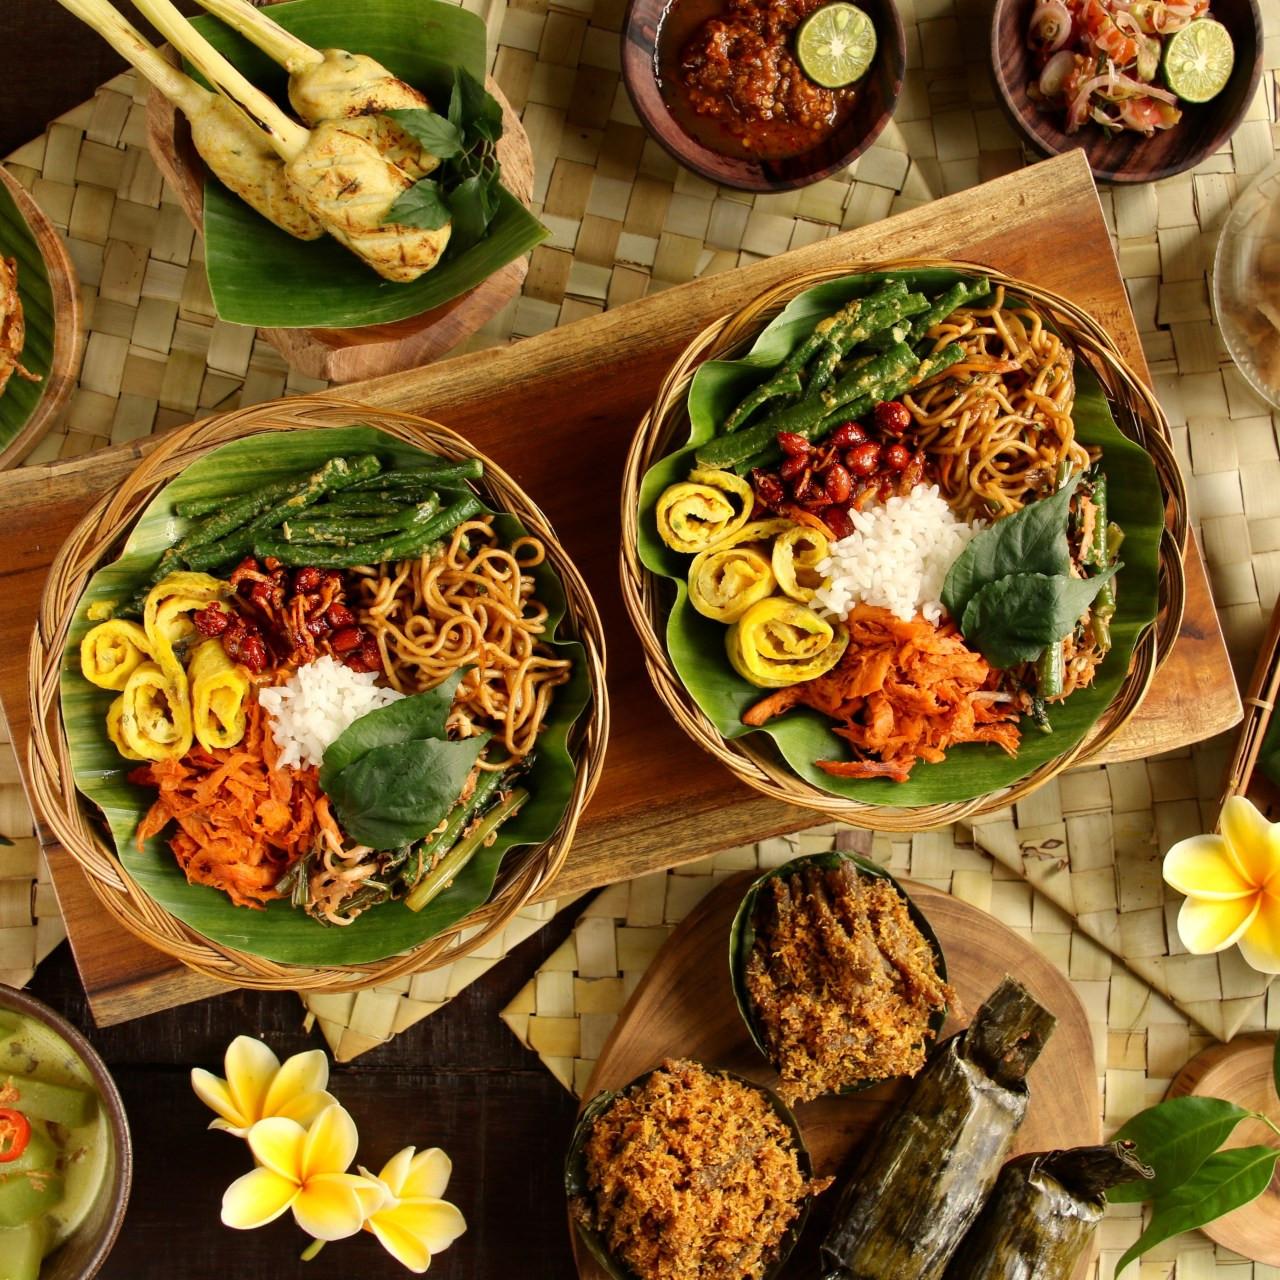 balinese food Indonesia